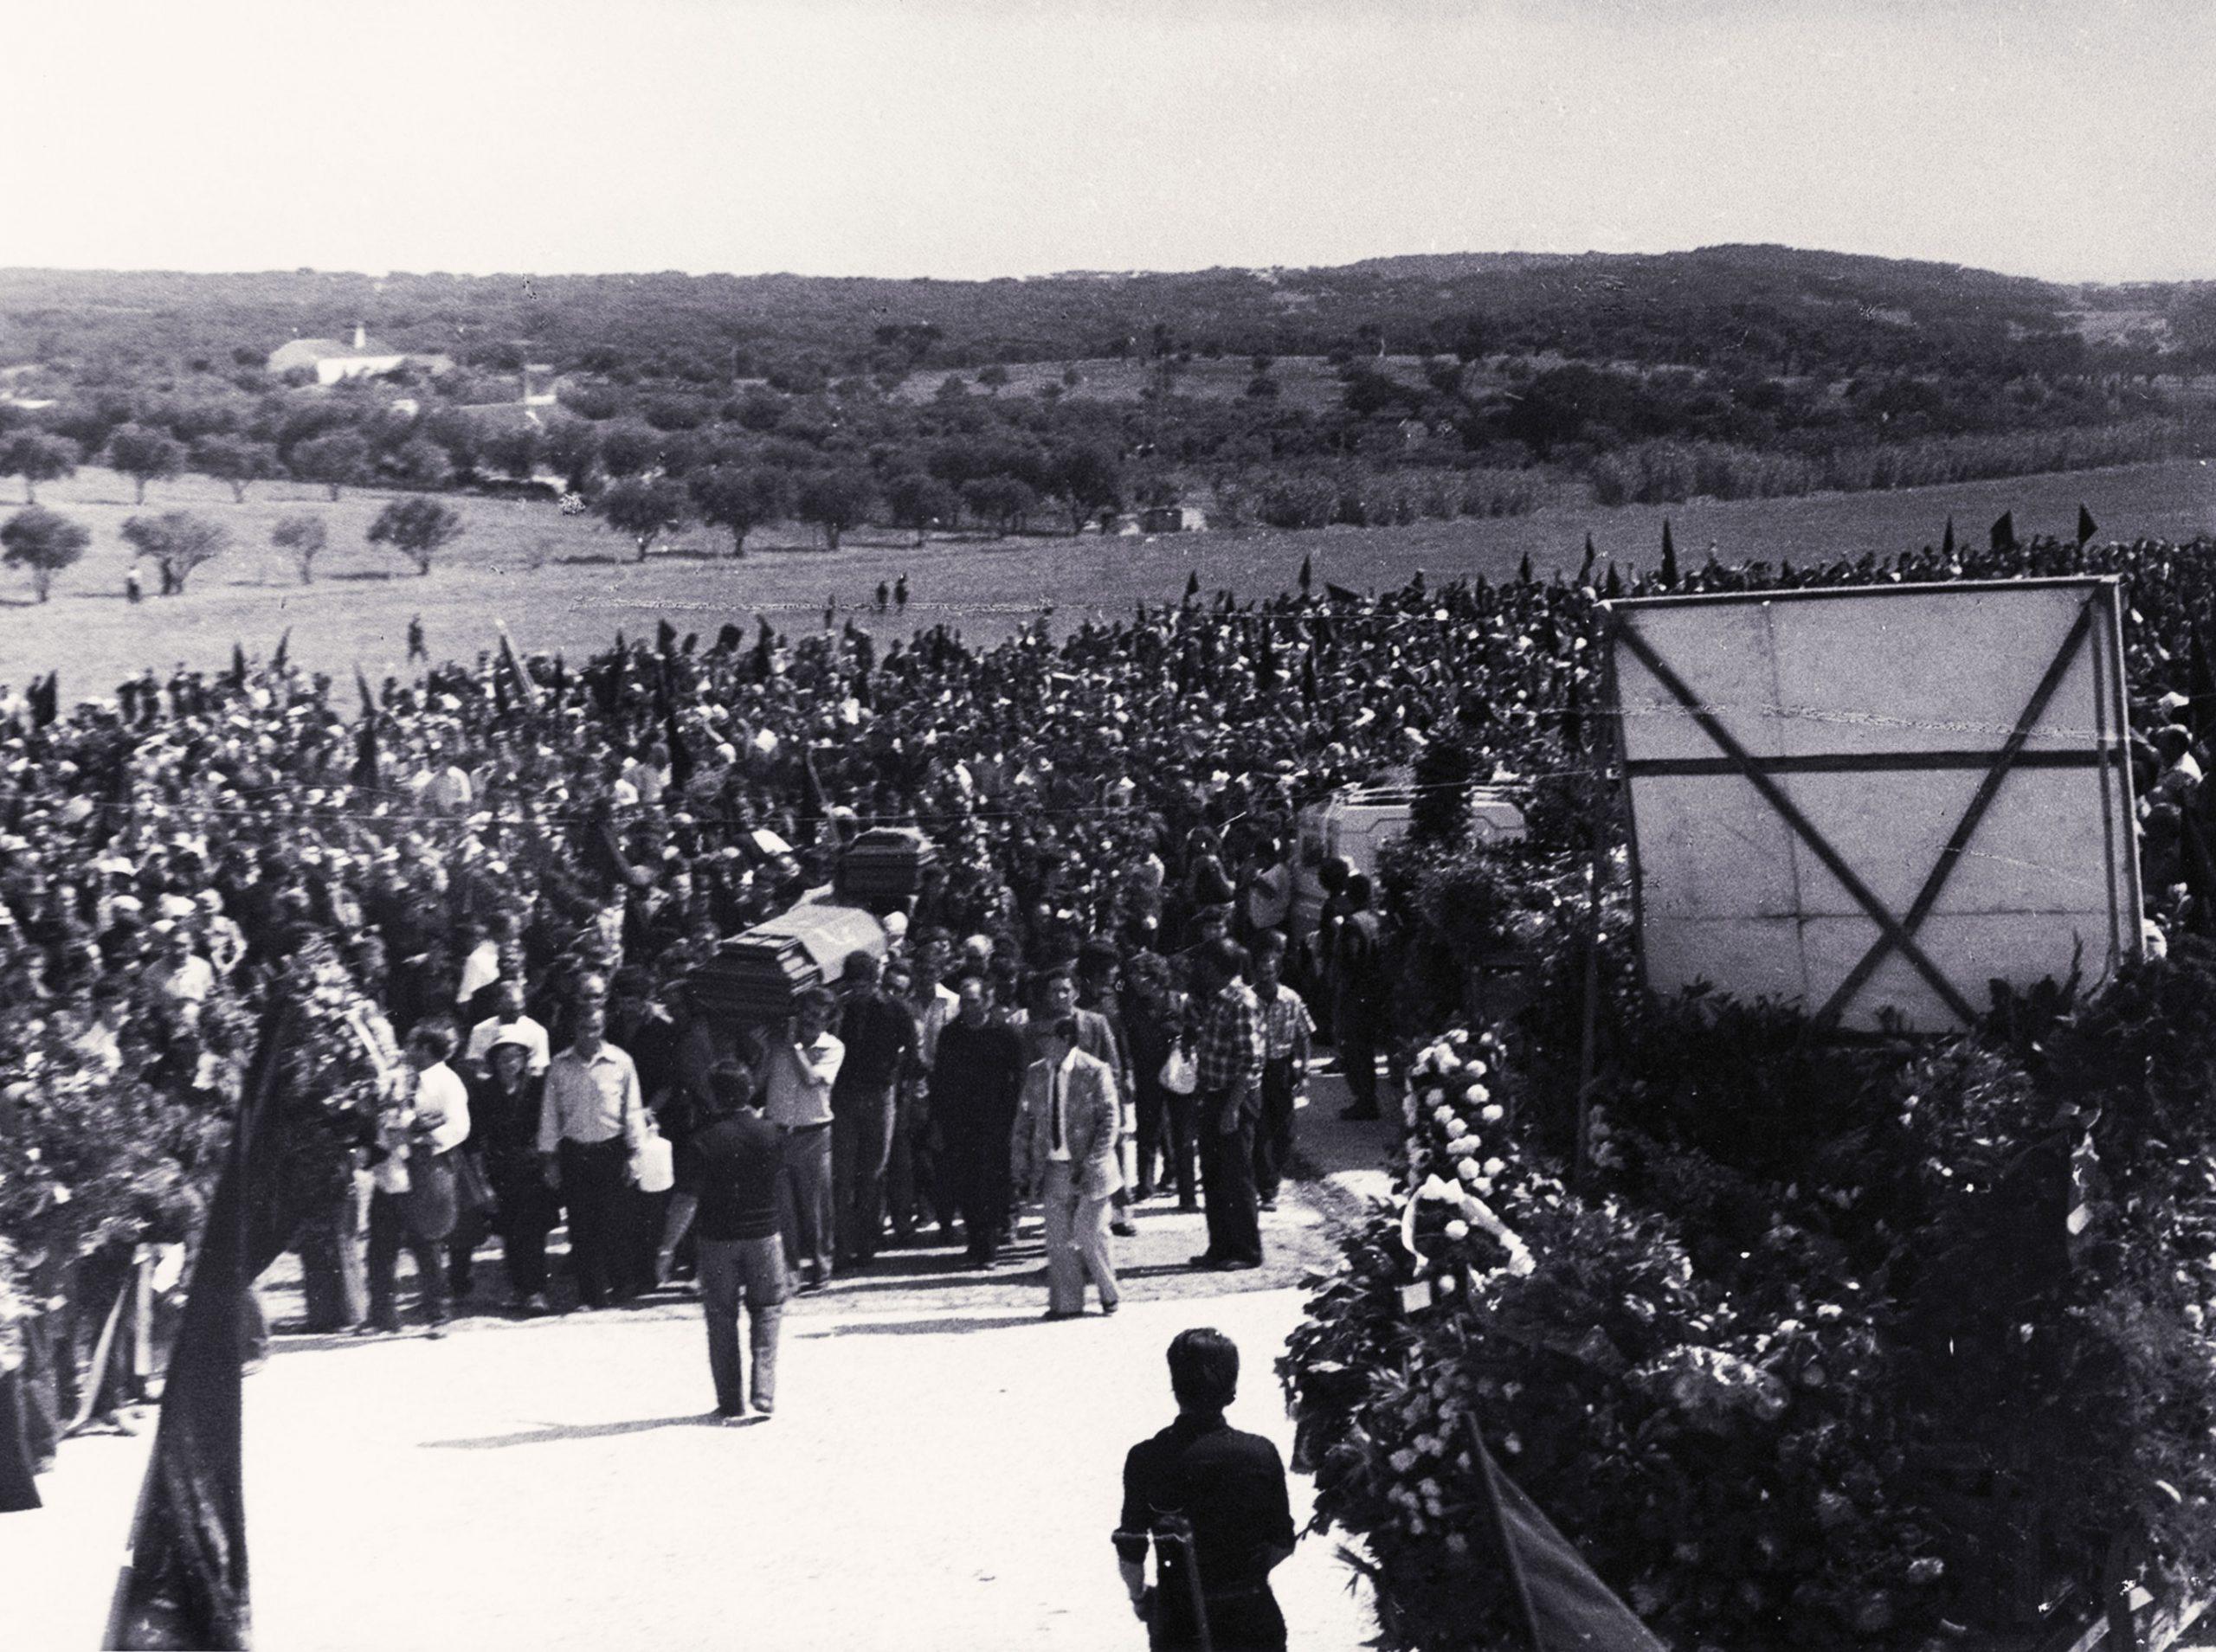 Funeral de Casquinha e Caravela (s/a, CMMN, 1979)